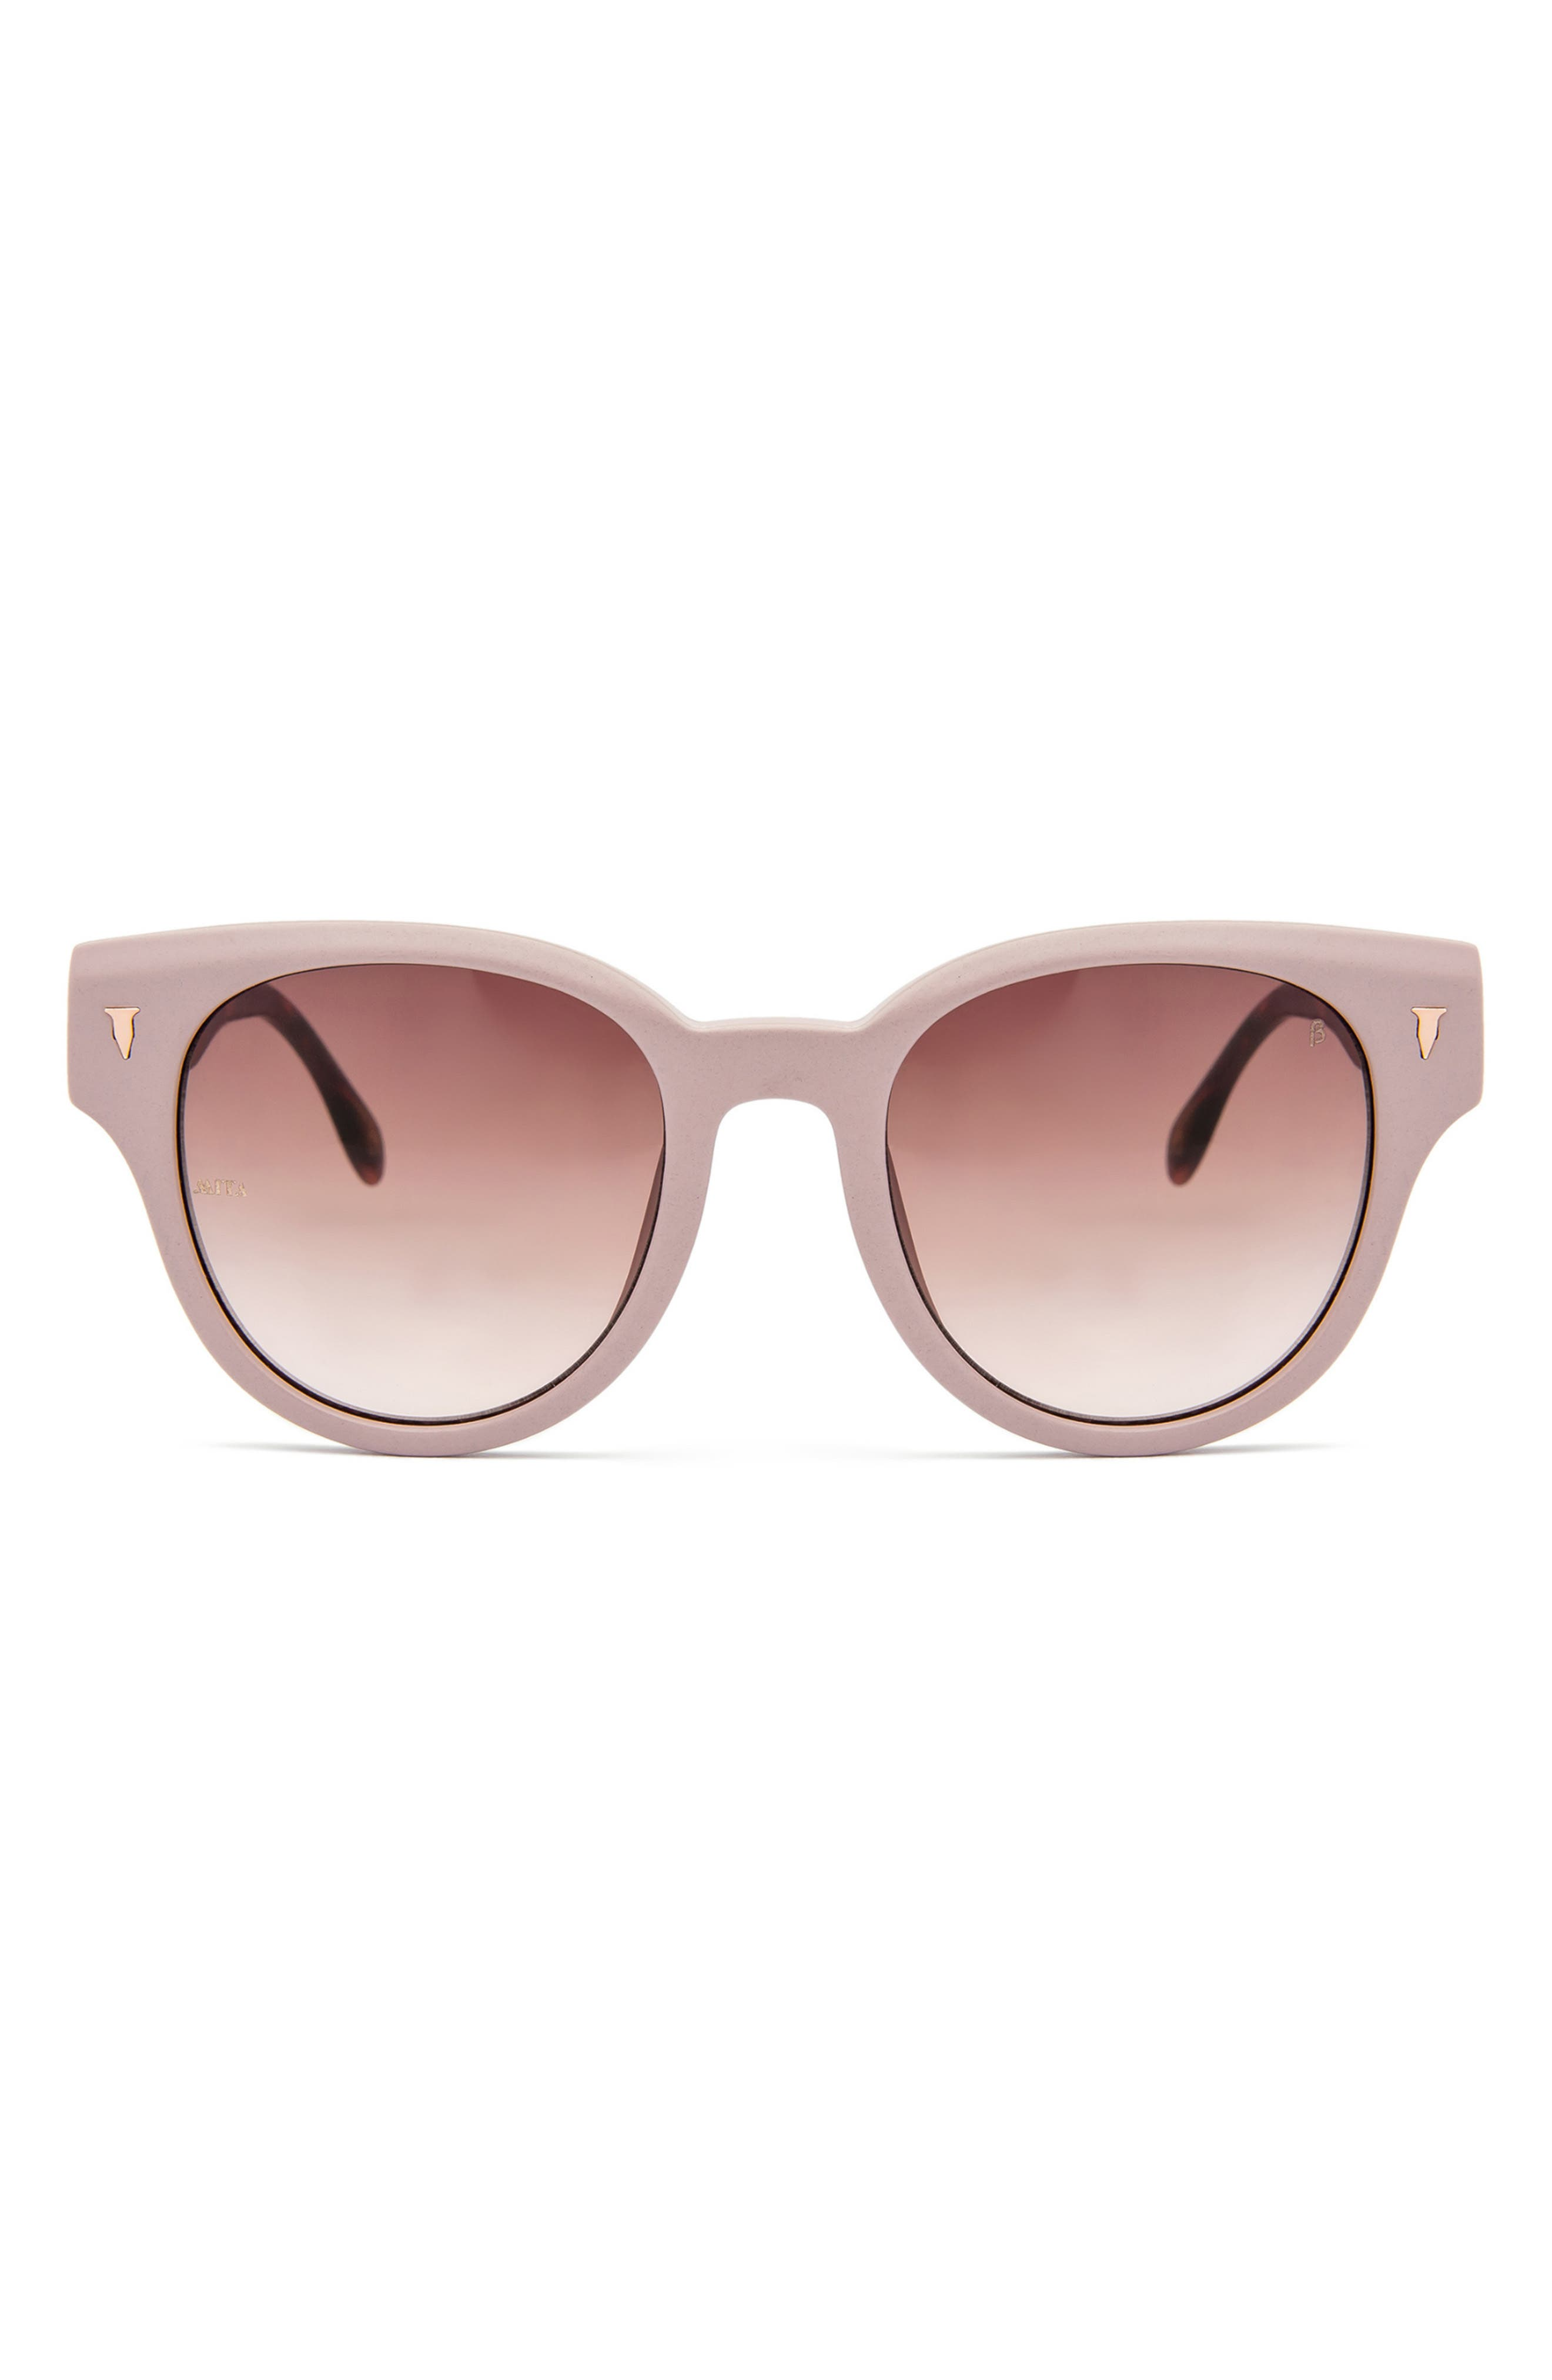 Brickell 50mm Round Sunglasses